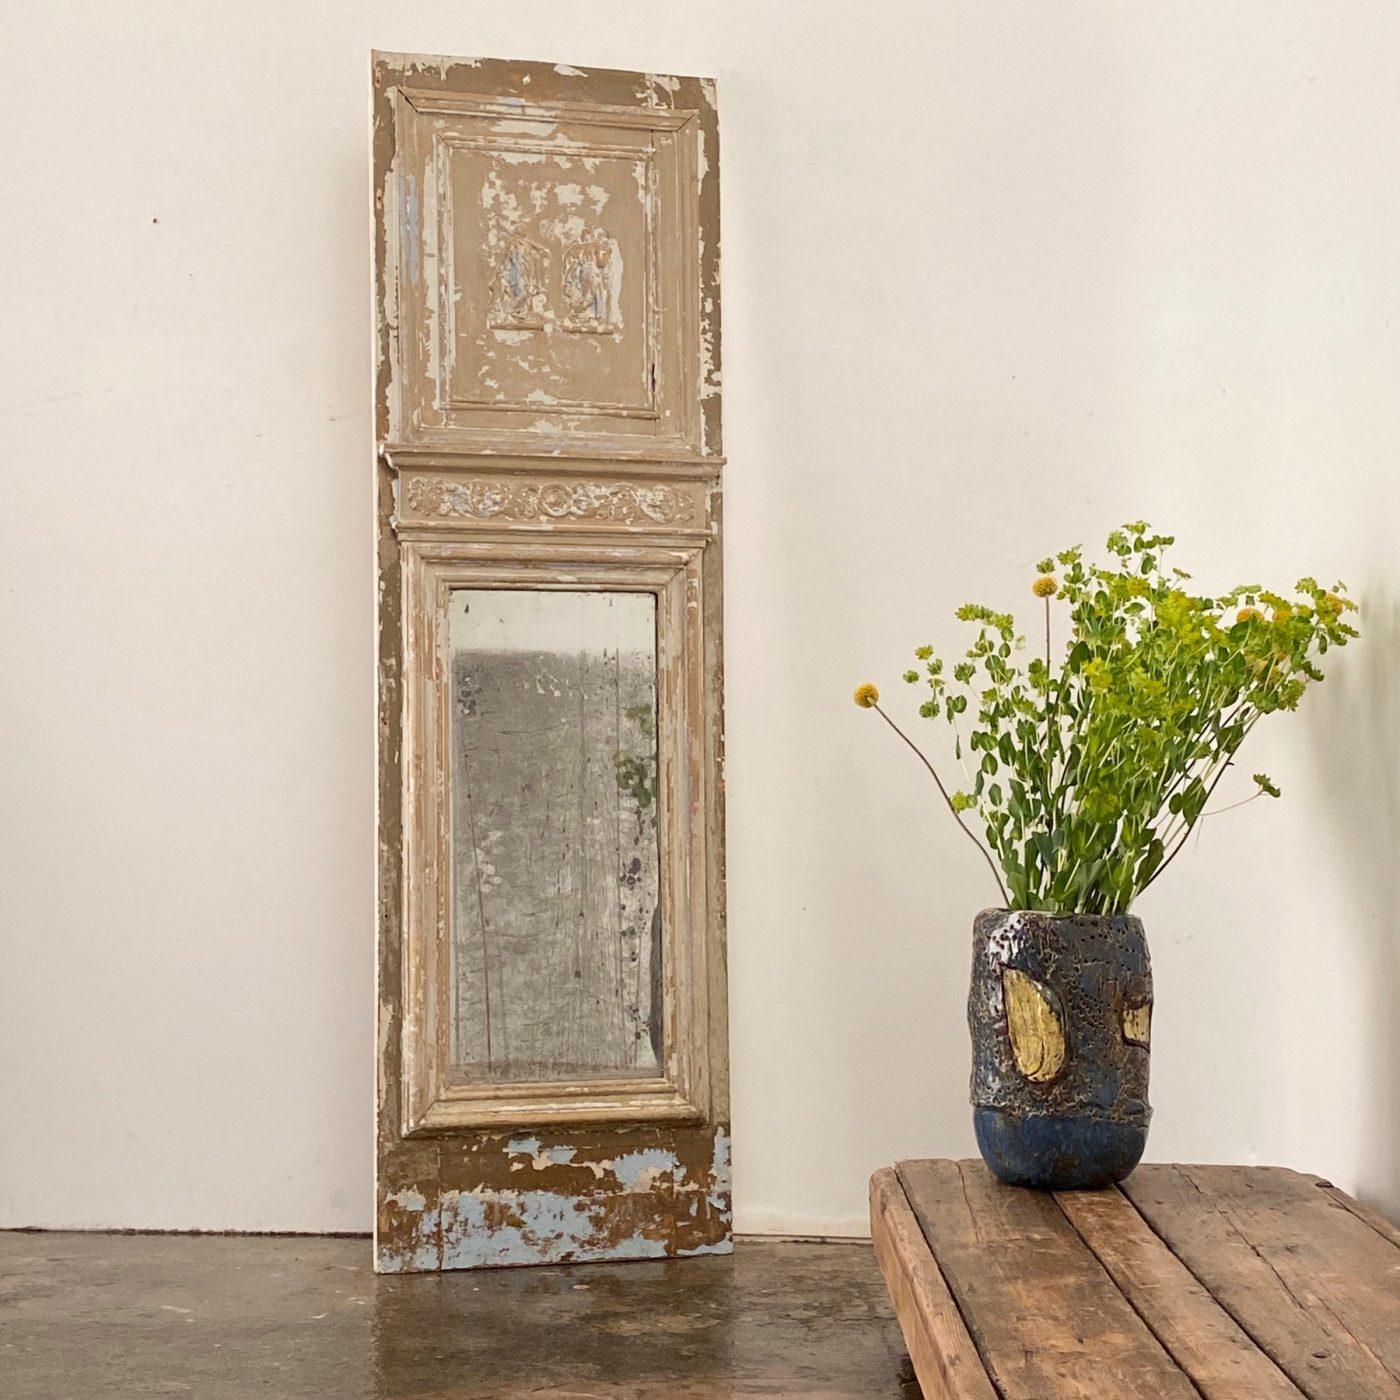 objet-vagabond-painted-mirror0001